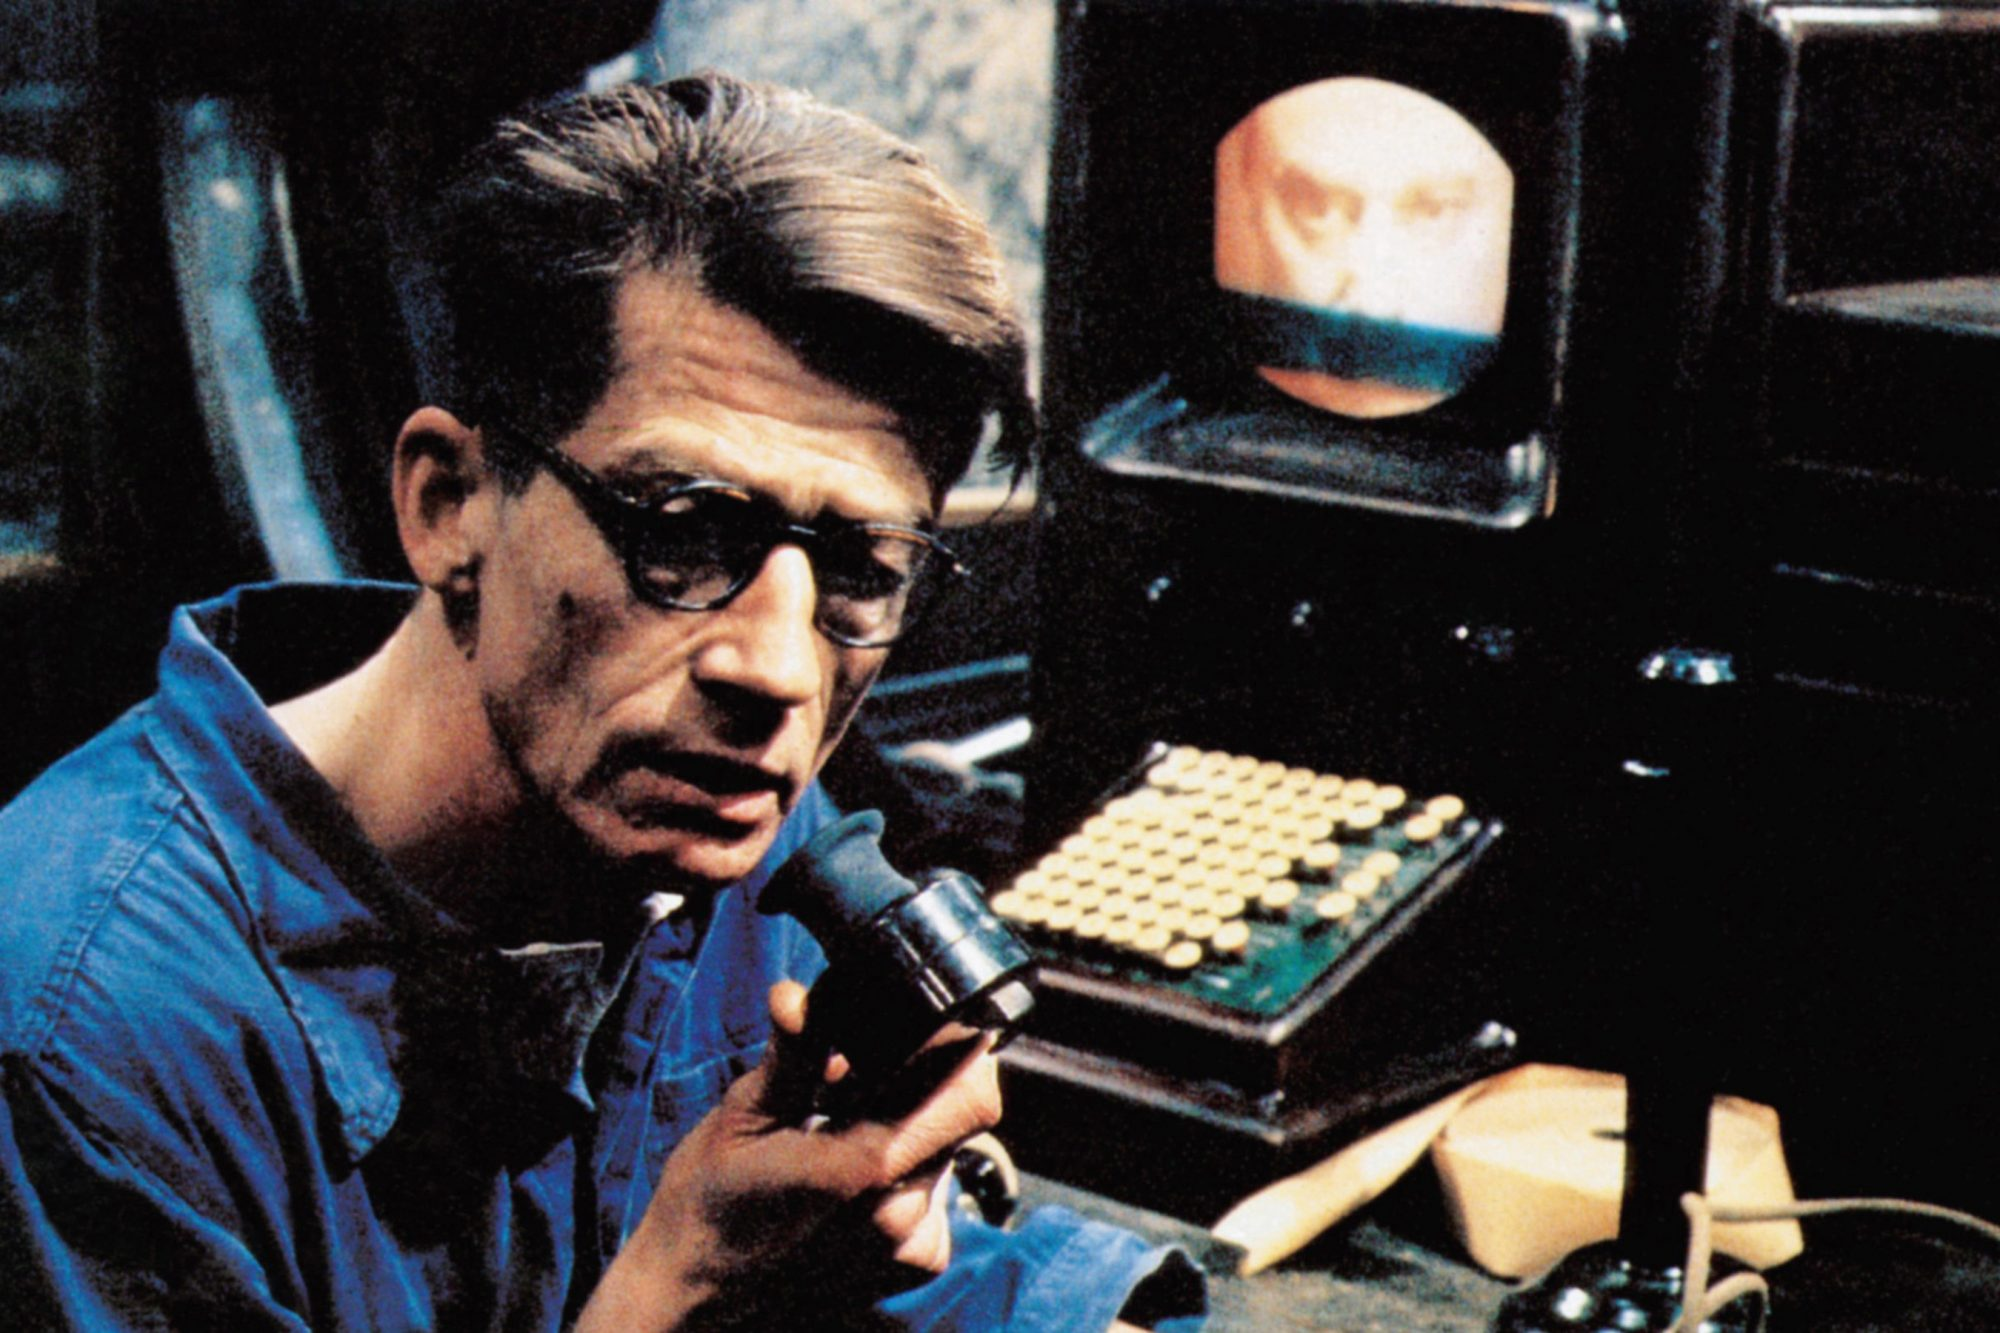 1984, (aka NINETEEN EIGHTY-FOUR), John Hurt, 1984. ©Atlantic Releasing/courtesy Everett Collection